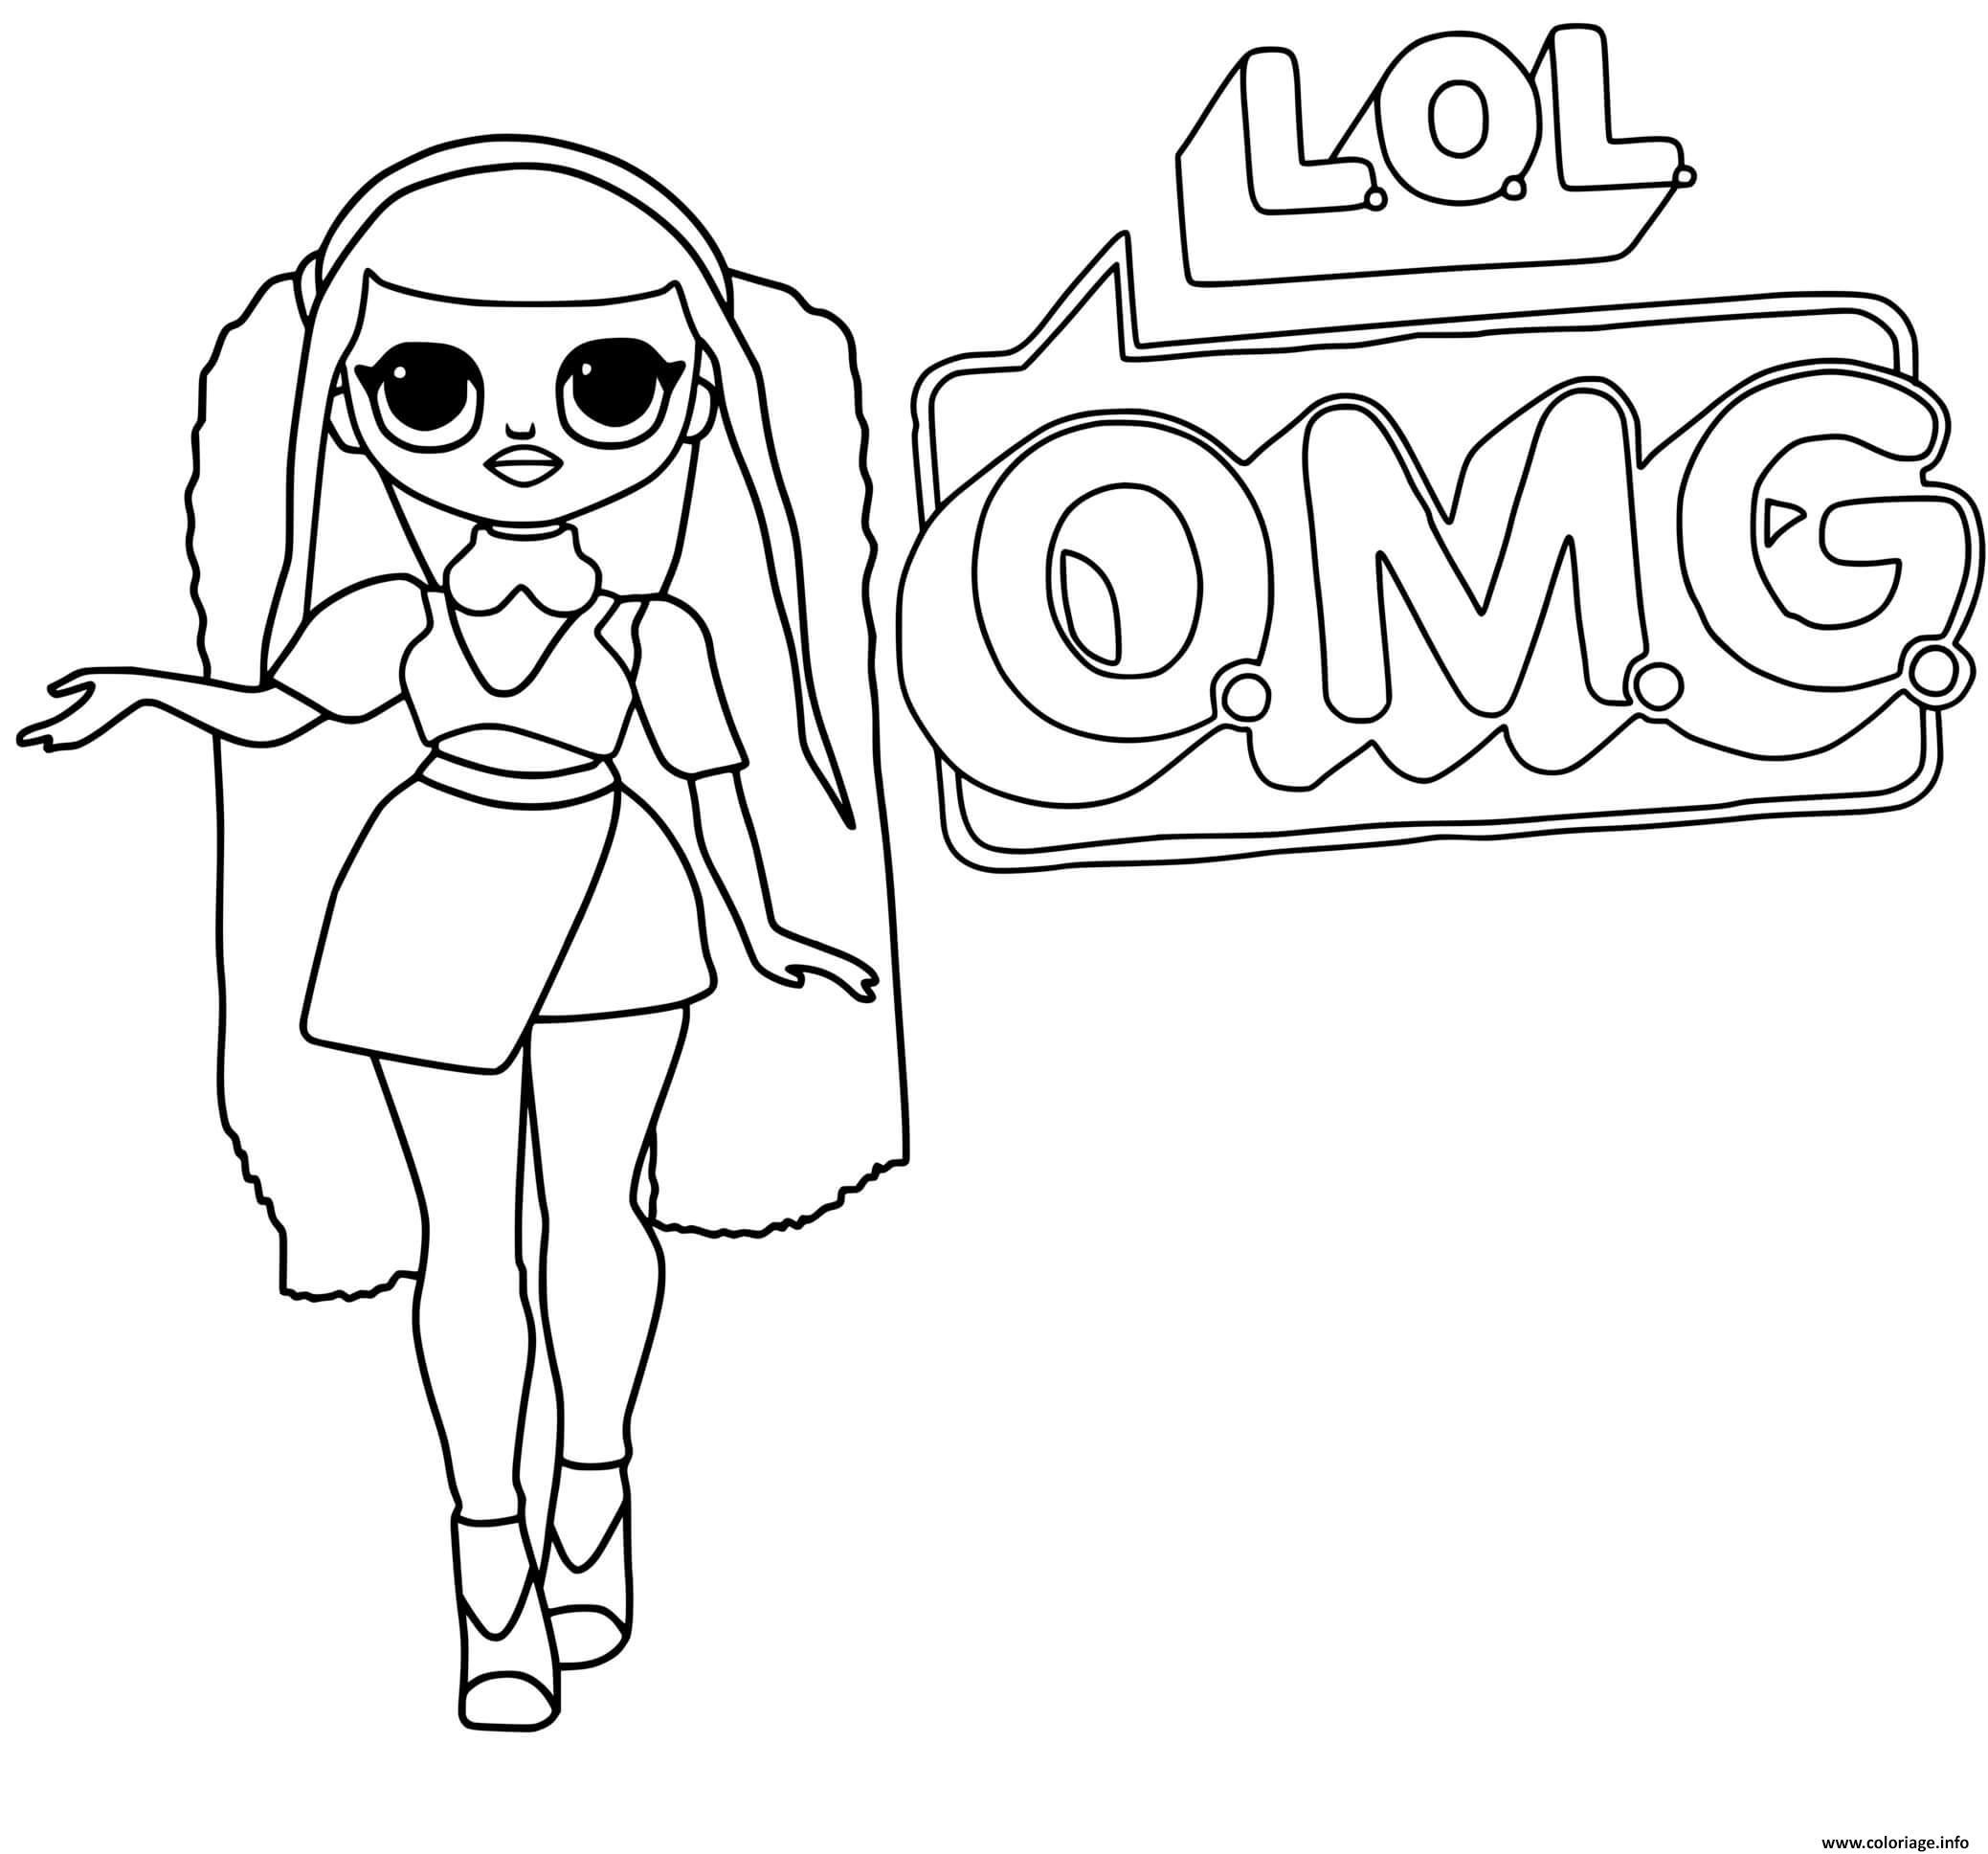 Dessin Lol Omg Logo Canylicious Girl Coloriage Gratuit à Imprimer